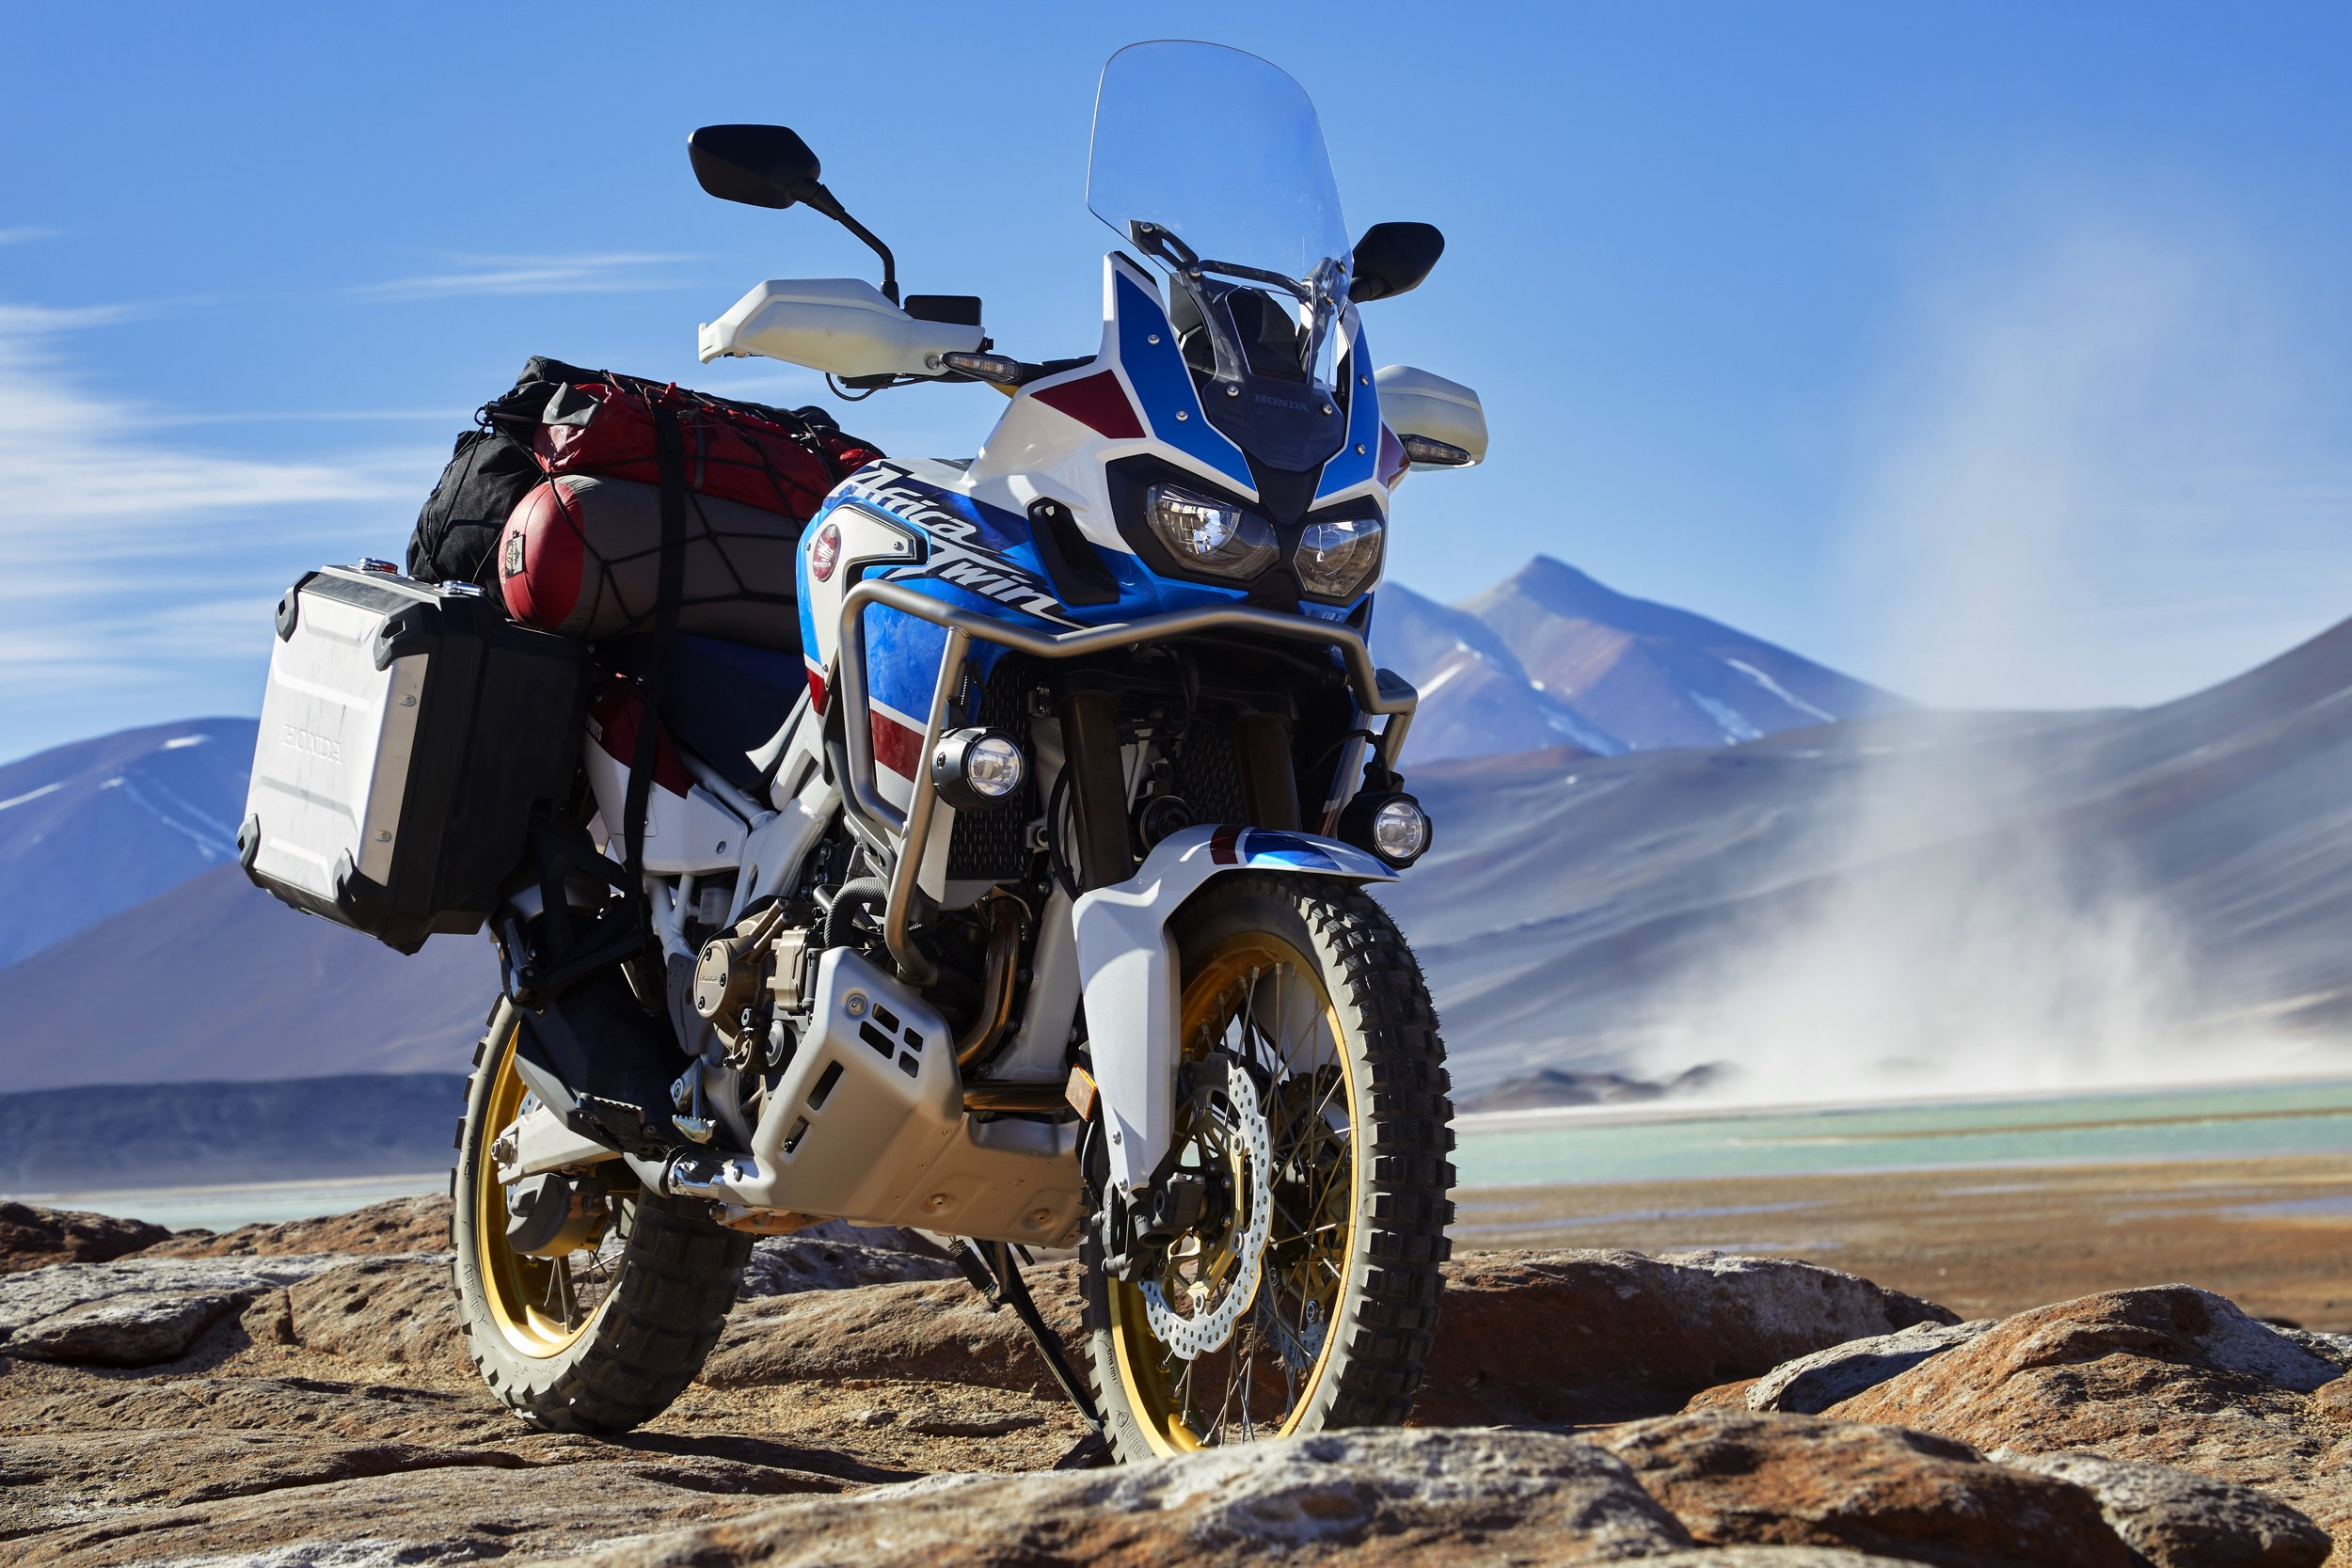 18_Honda_Africa_Twin_Adventure_Sports_Action_Image_11.jpg